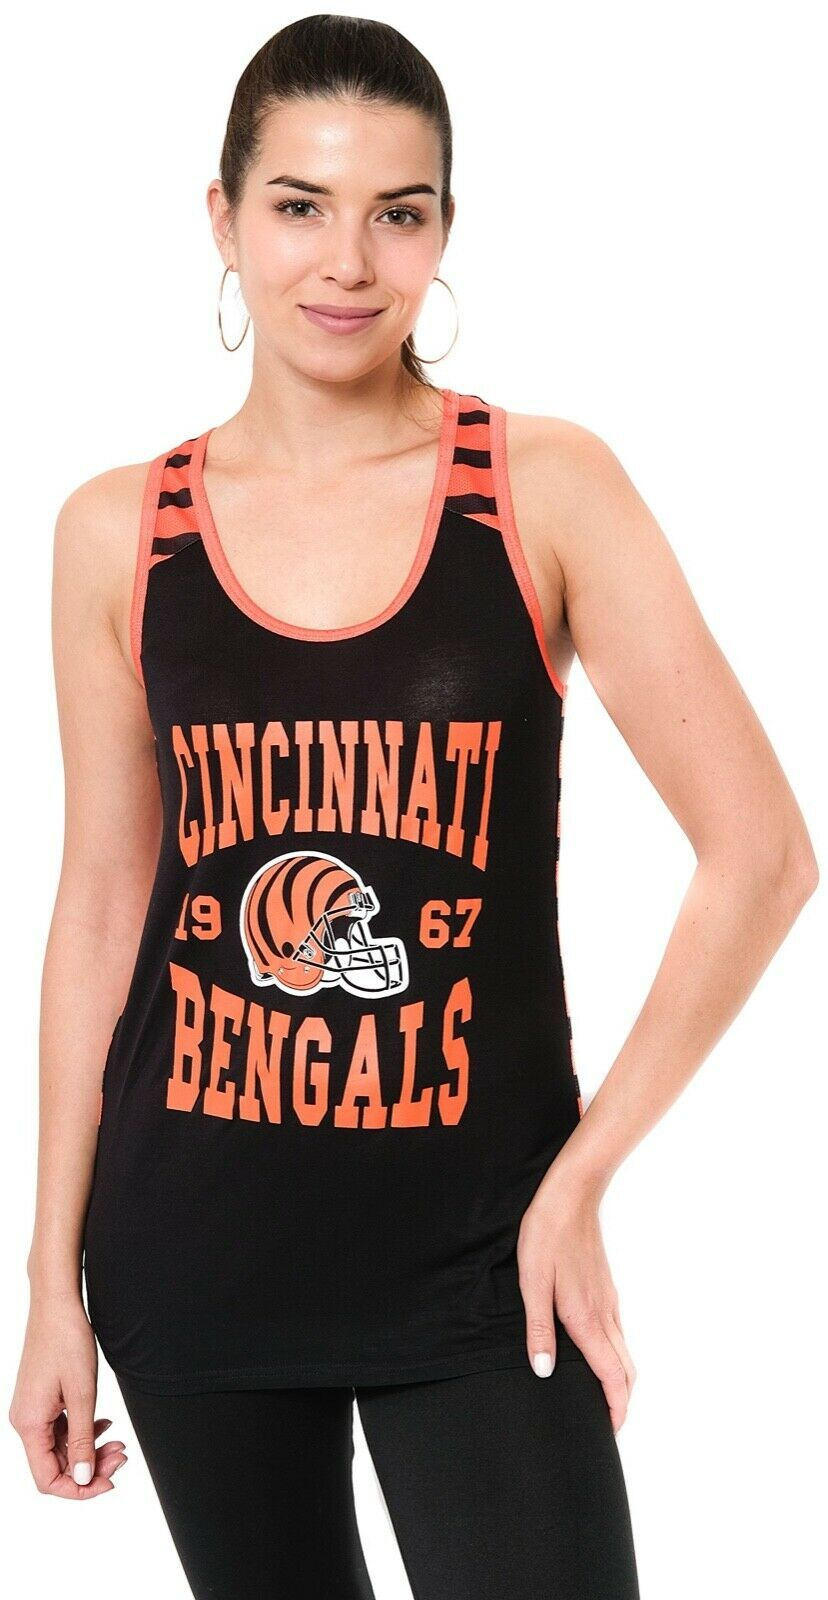 Cincinnati Bengals Striped Tank Top Women Sz S Racerback NFL Team Apparel C23-16 - $25.24